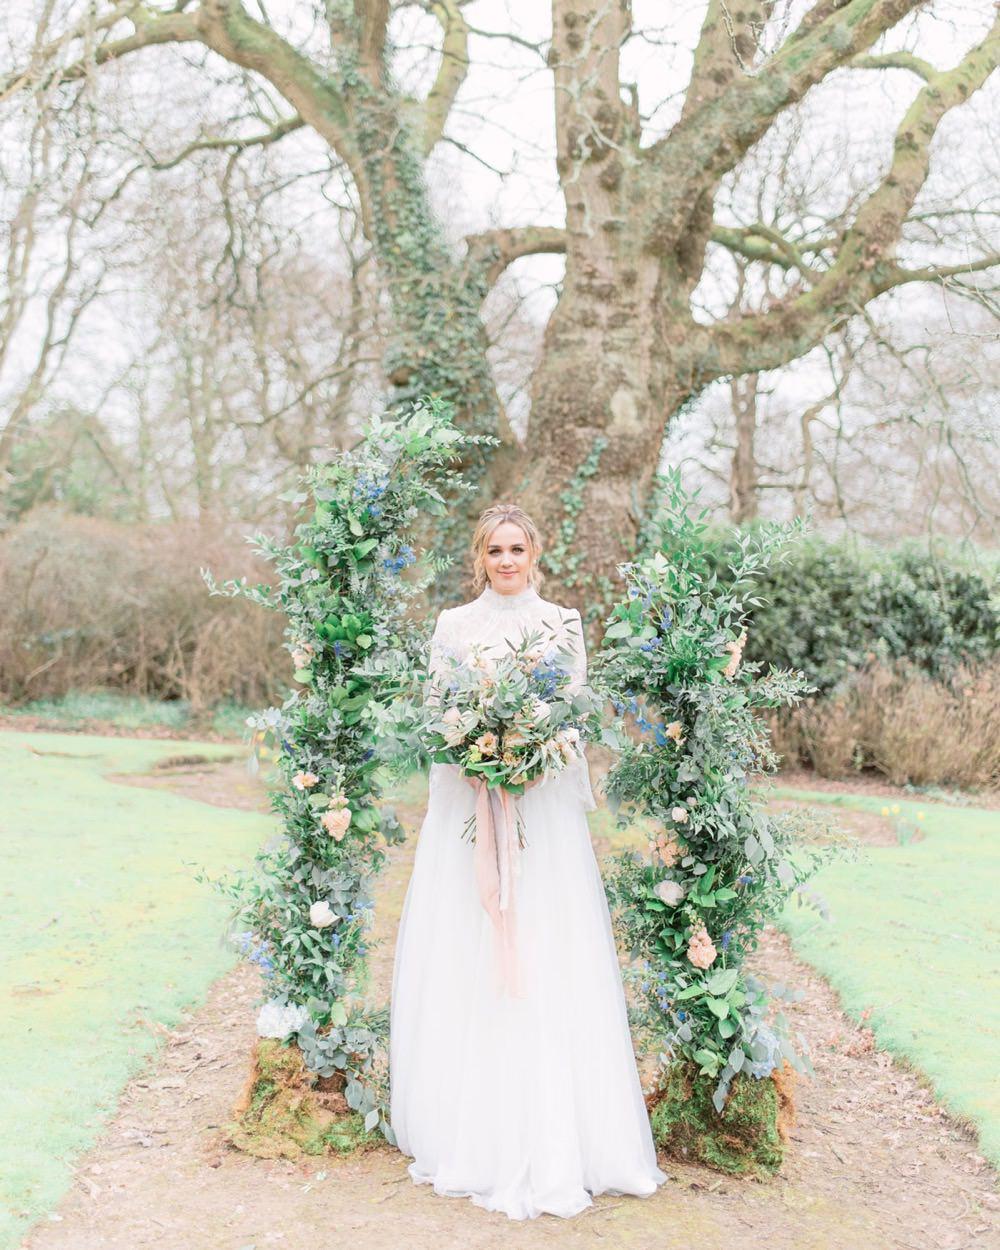 Unstructured Flower Arch Peach Greenery Foliage Backdrop Natural Elegant Wedding Ideas Yll Weddings